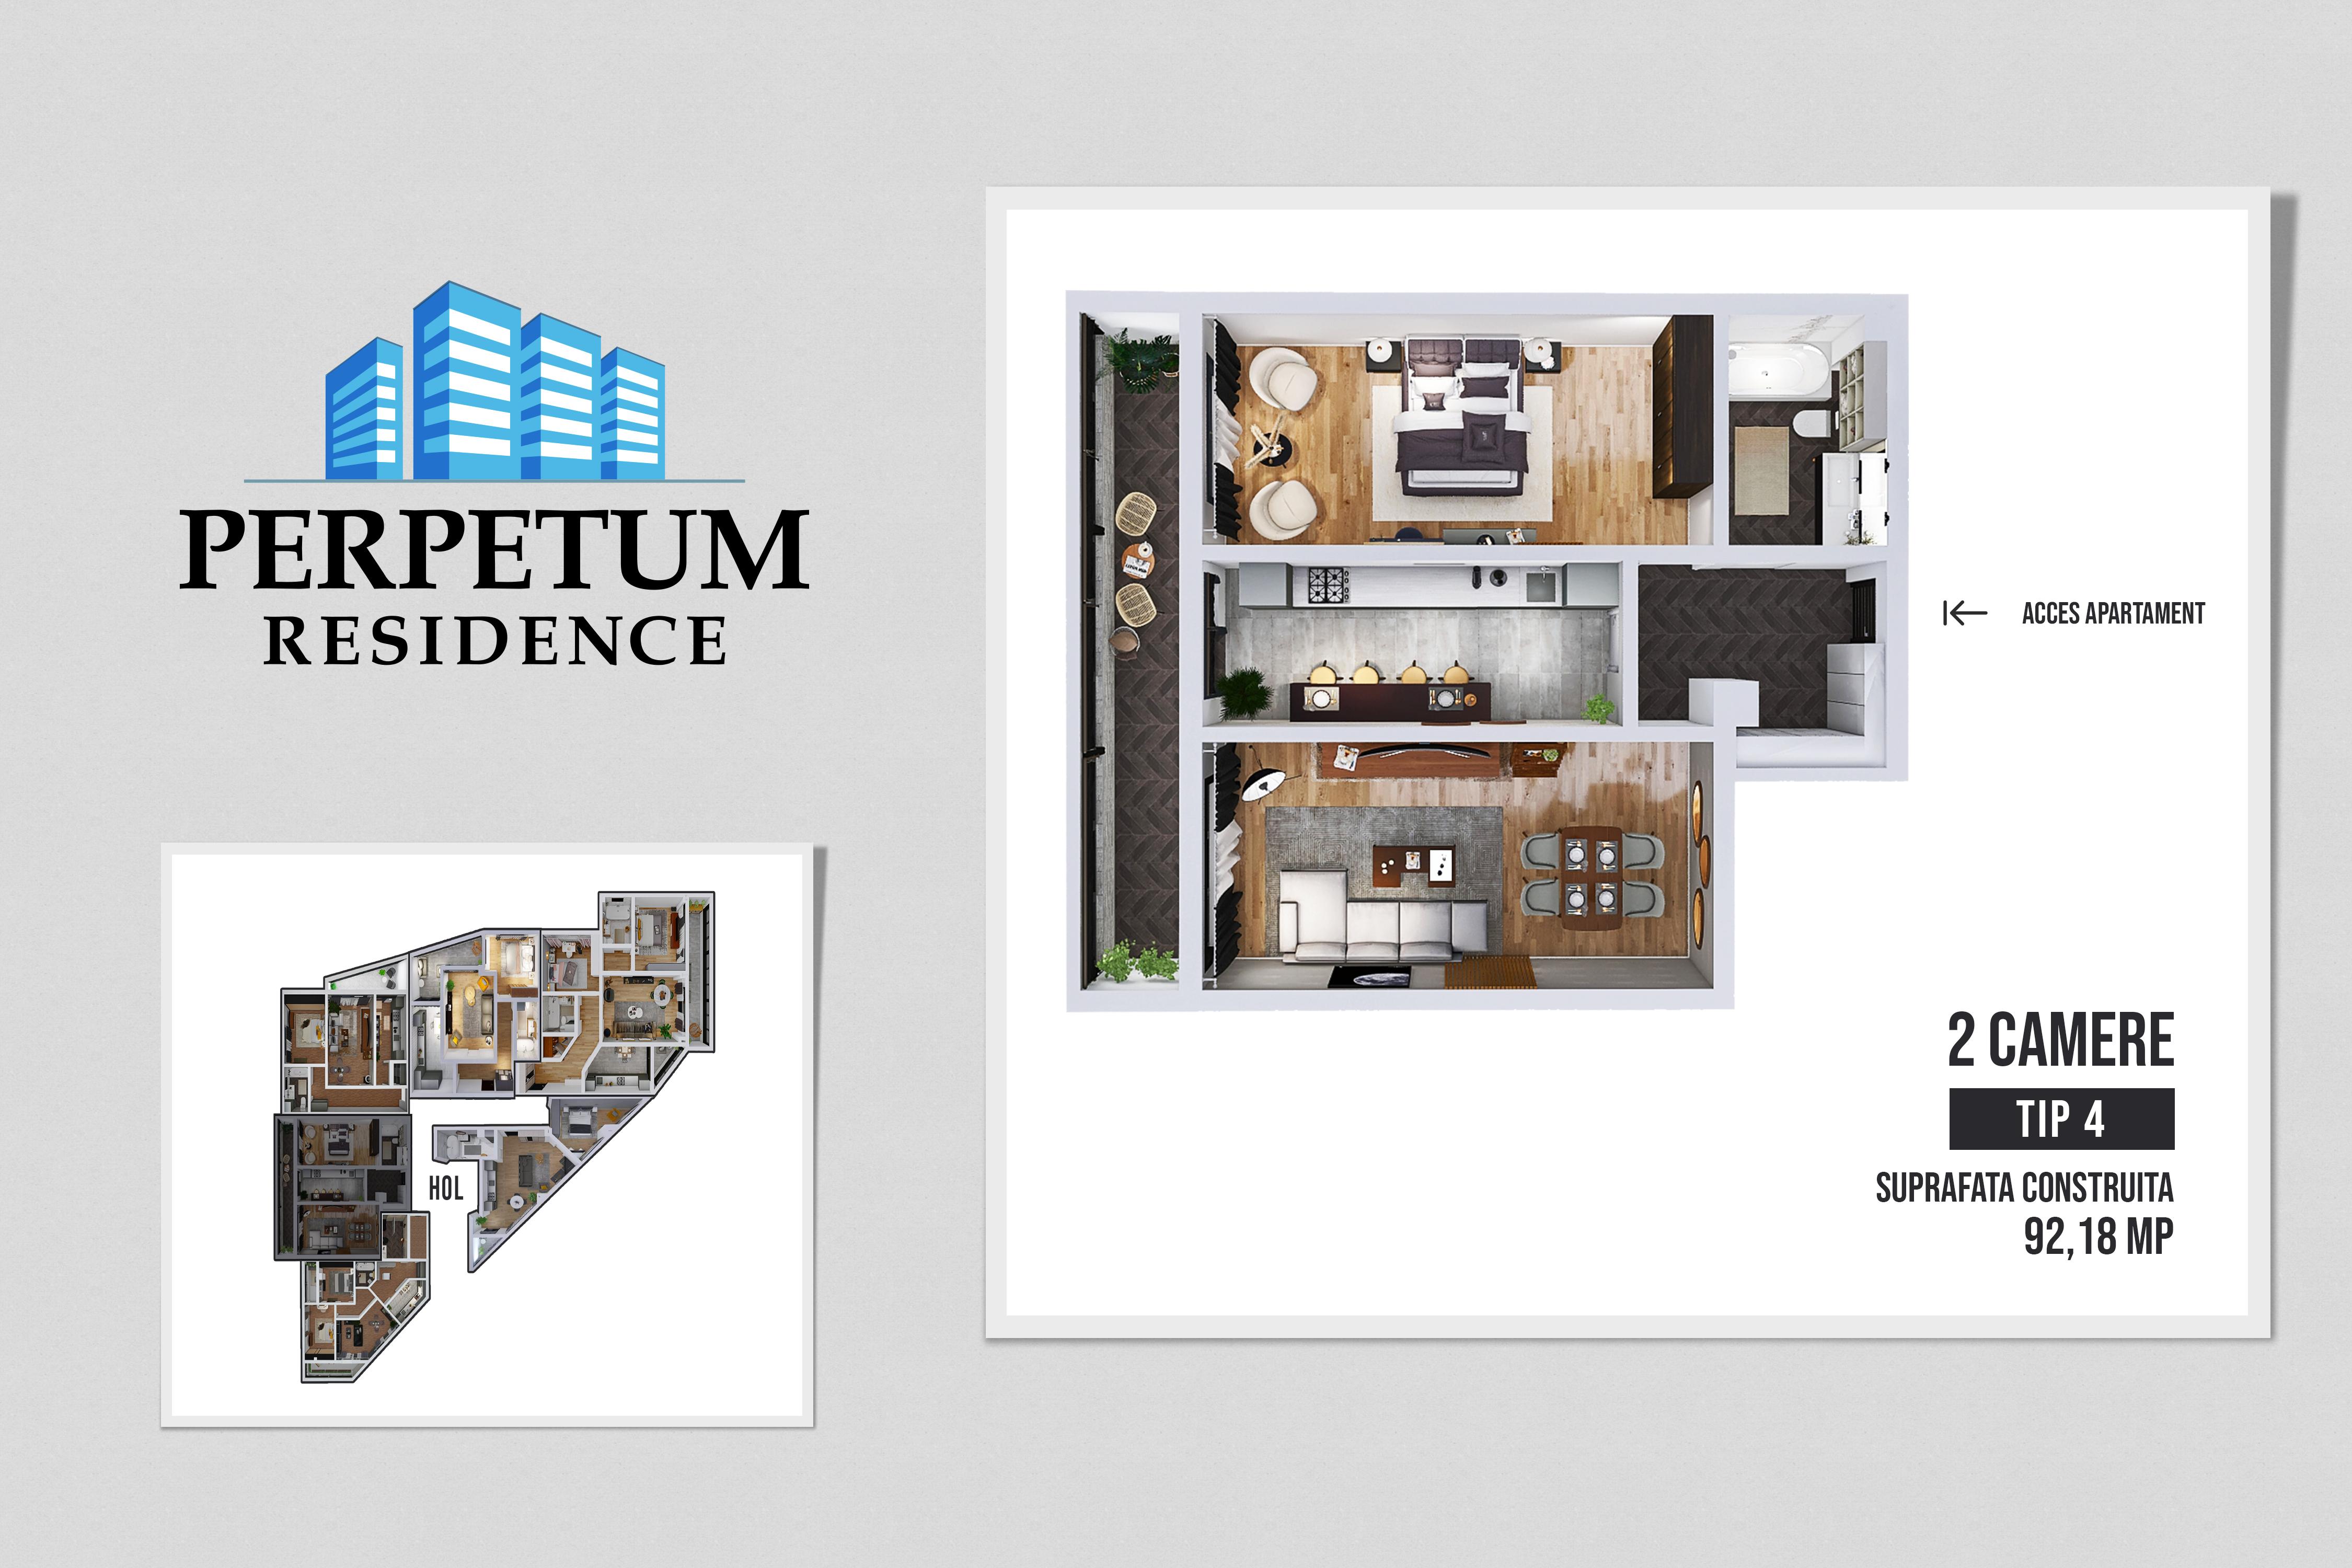 DIRECT DEZVOLTATOR! COMISION 0% Tomis Nord - Apartament cu 2 camere TIP 4 in Complex Perpetum Residence II